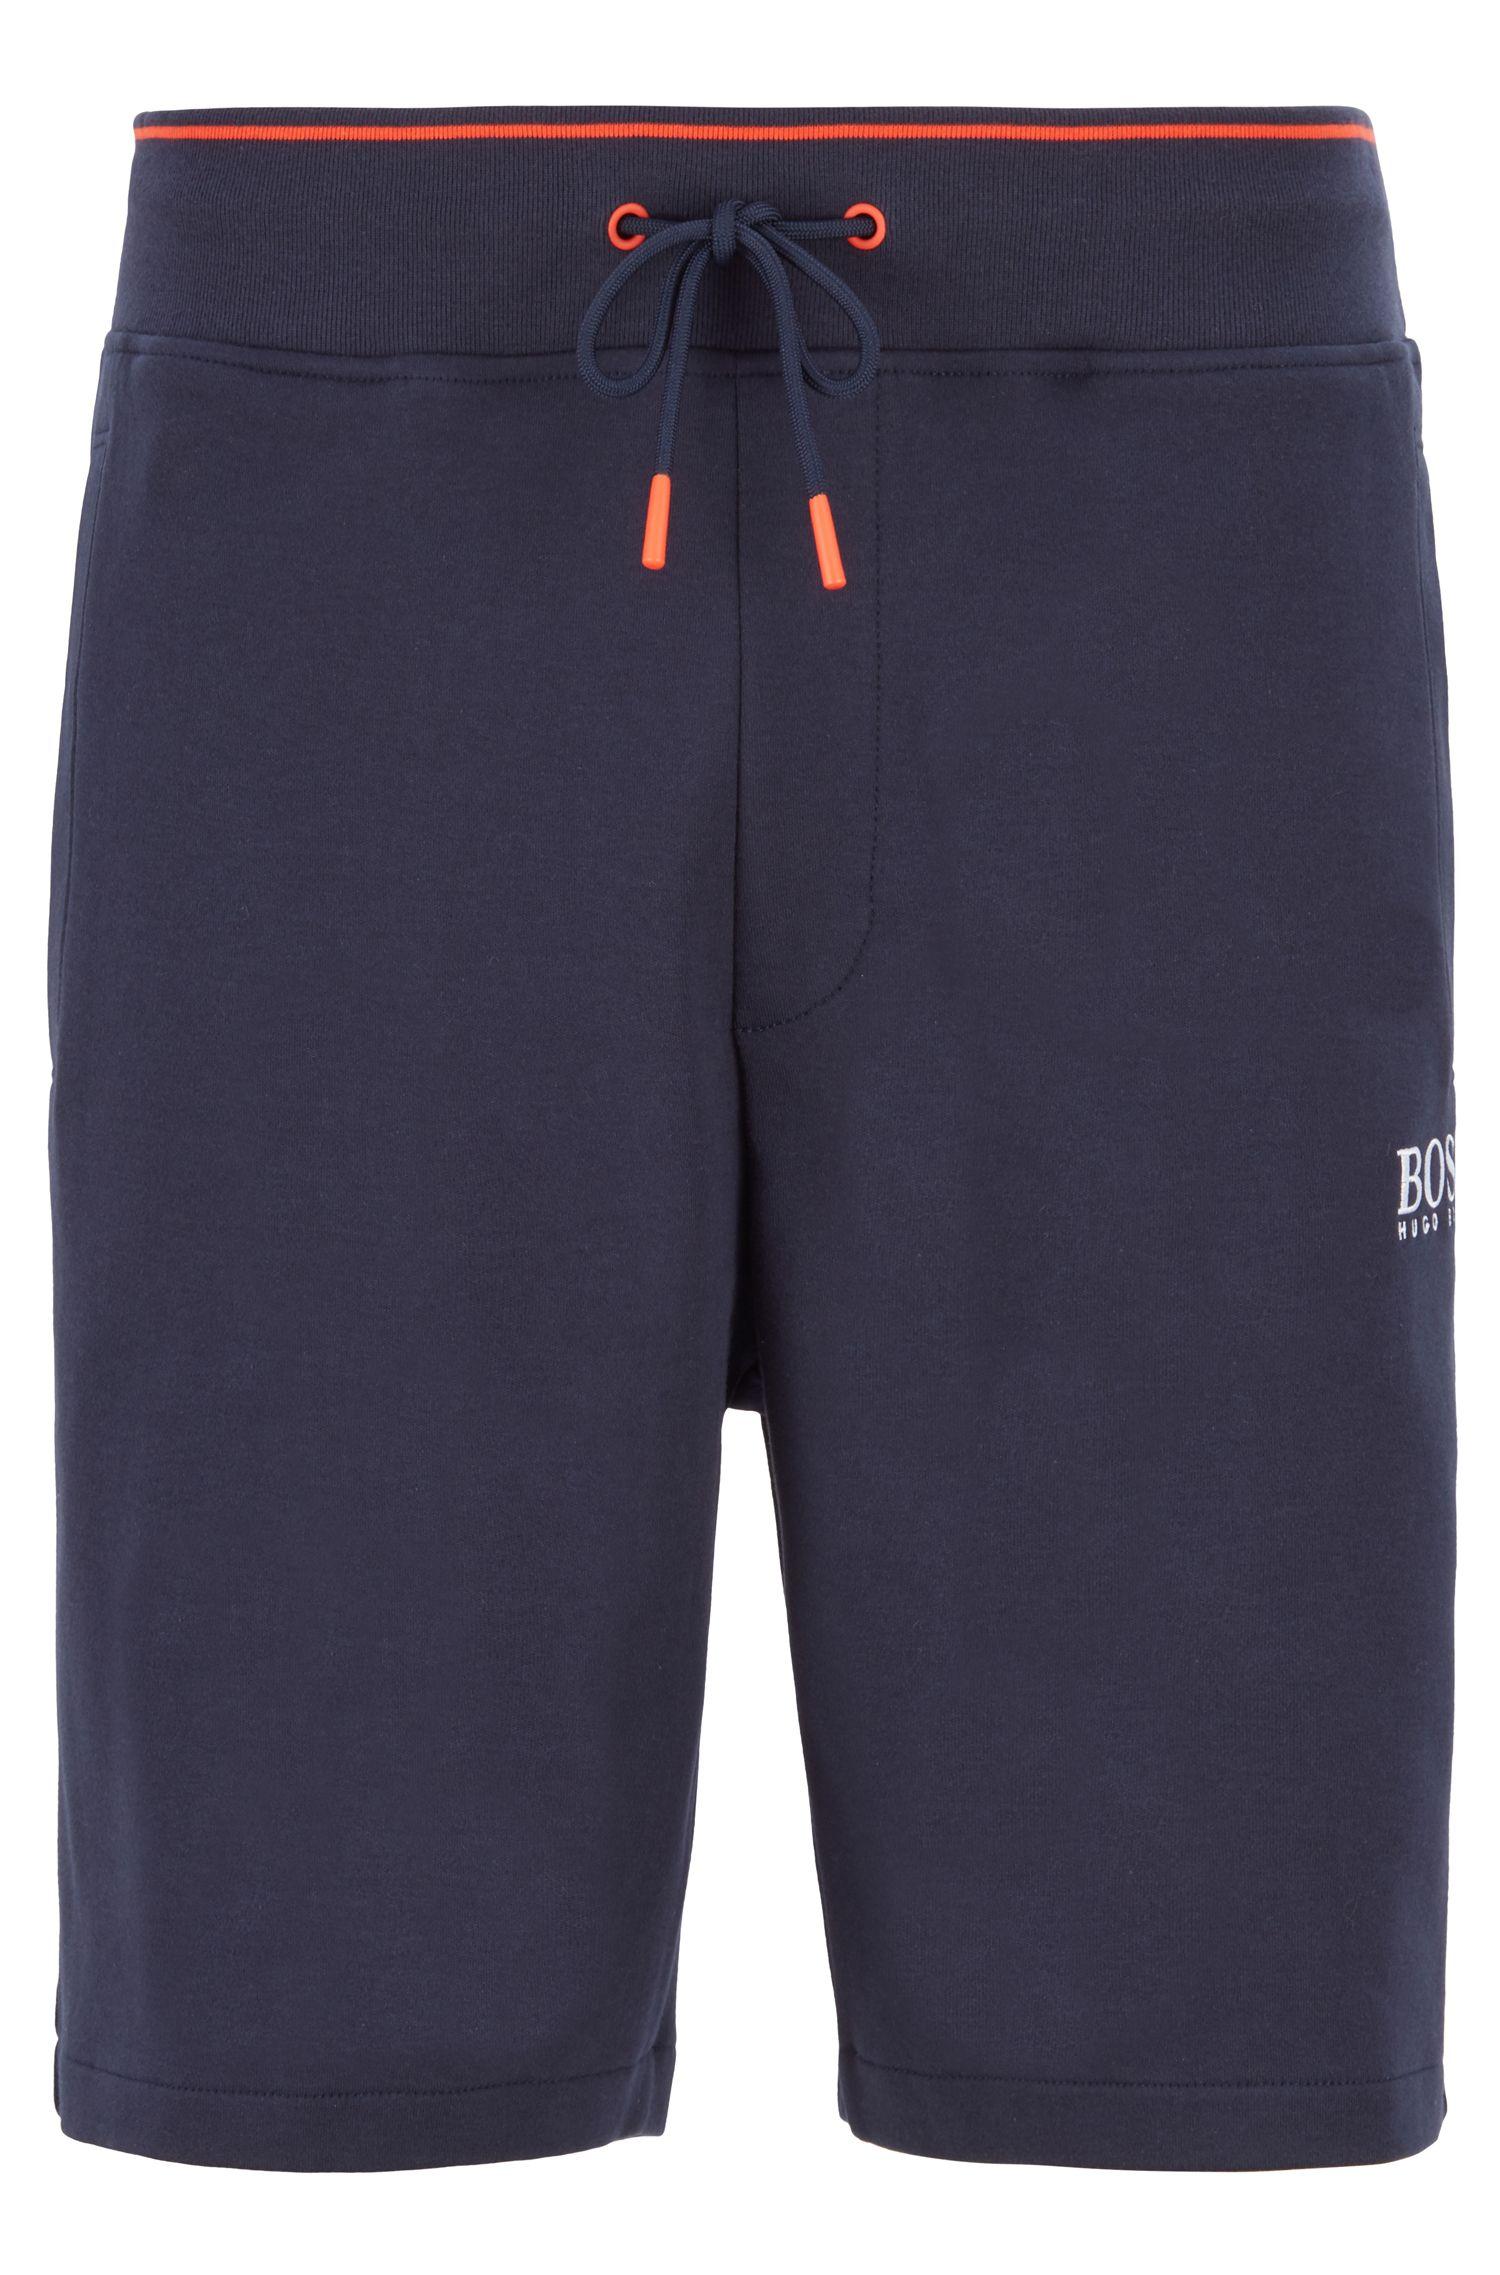 Loungewear shorts with Coolest Comfort finishing, Dark Blue